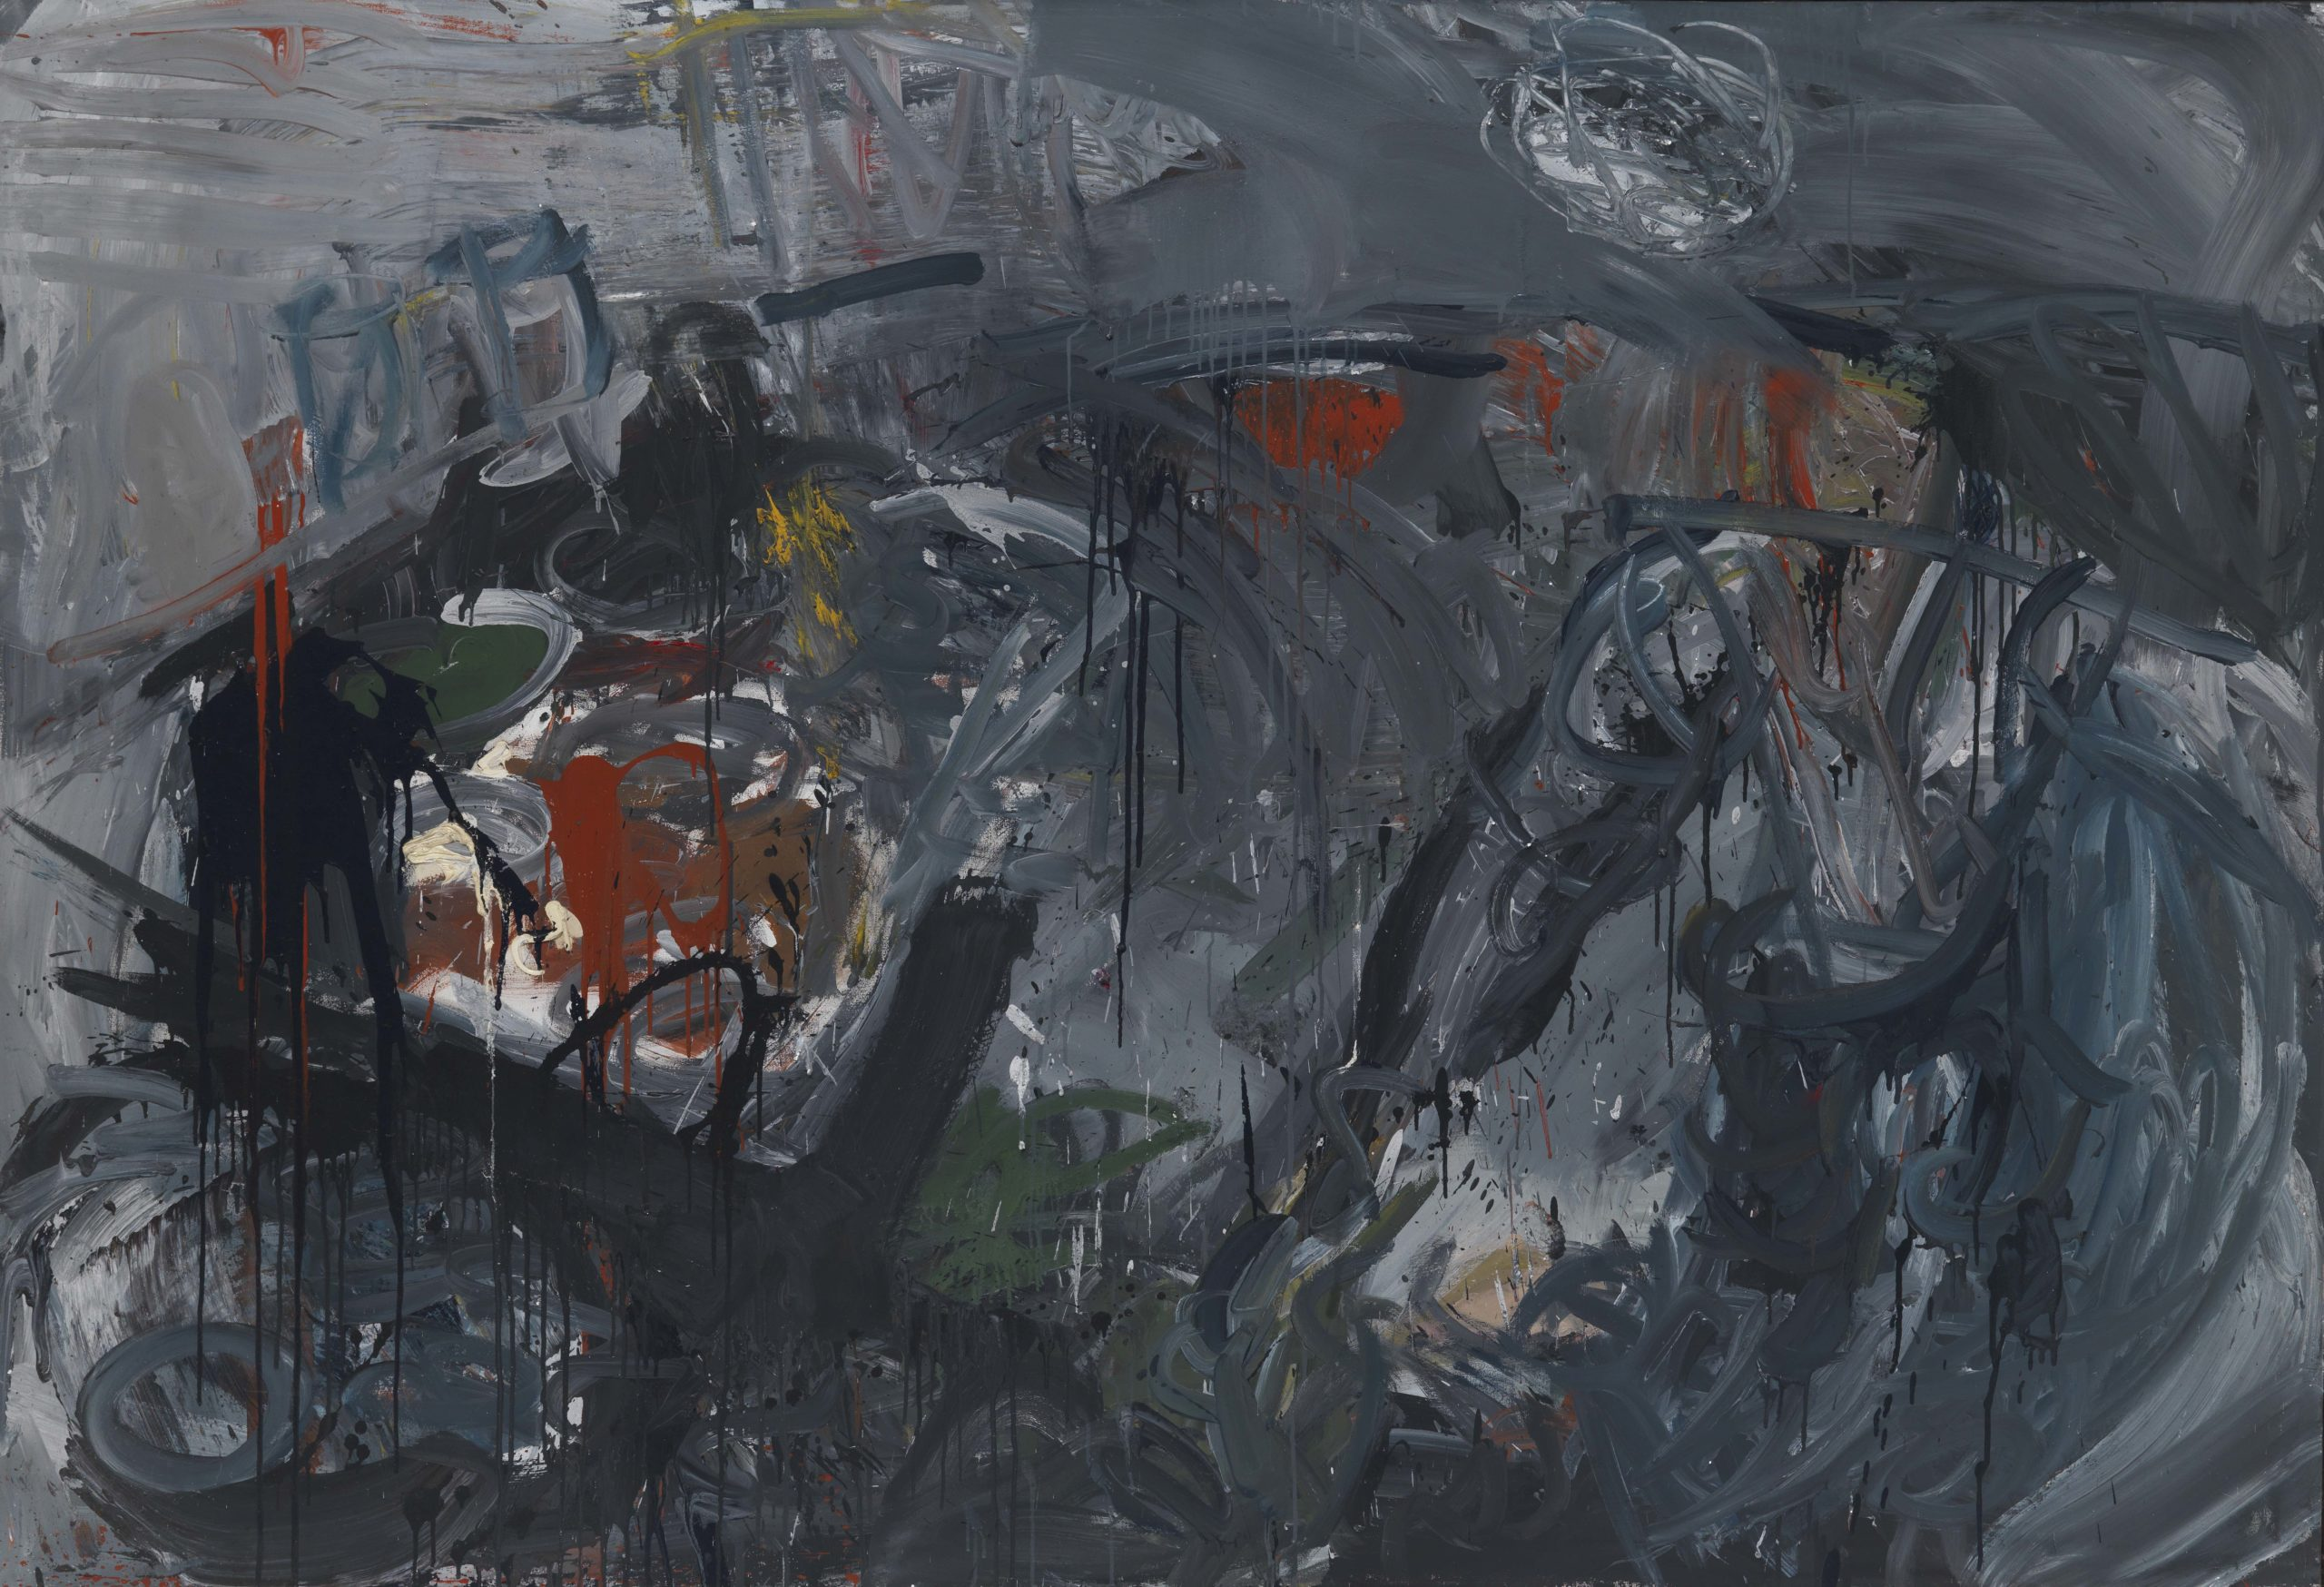 Reinhard Pods, Untitled, 1976, oil on canvas, 169.8 x 250 cm